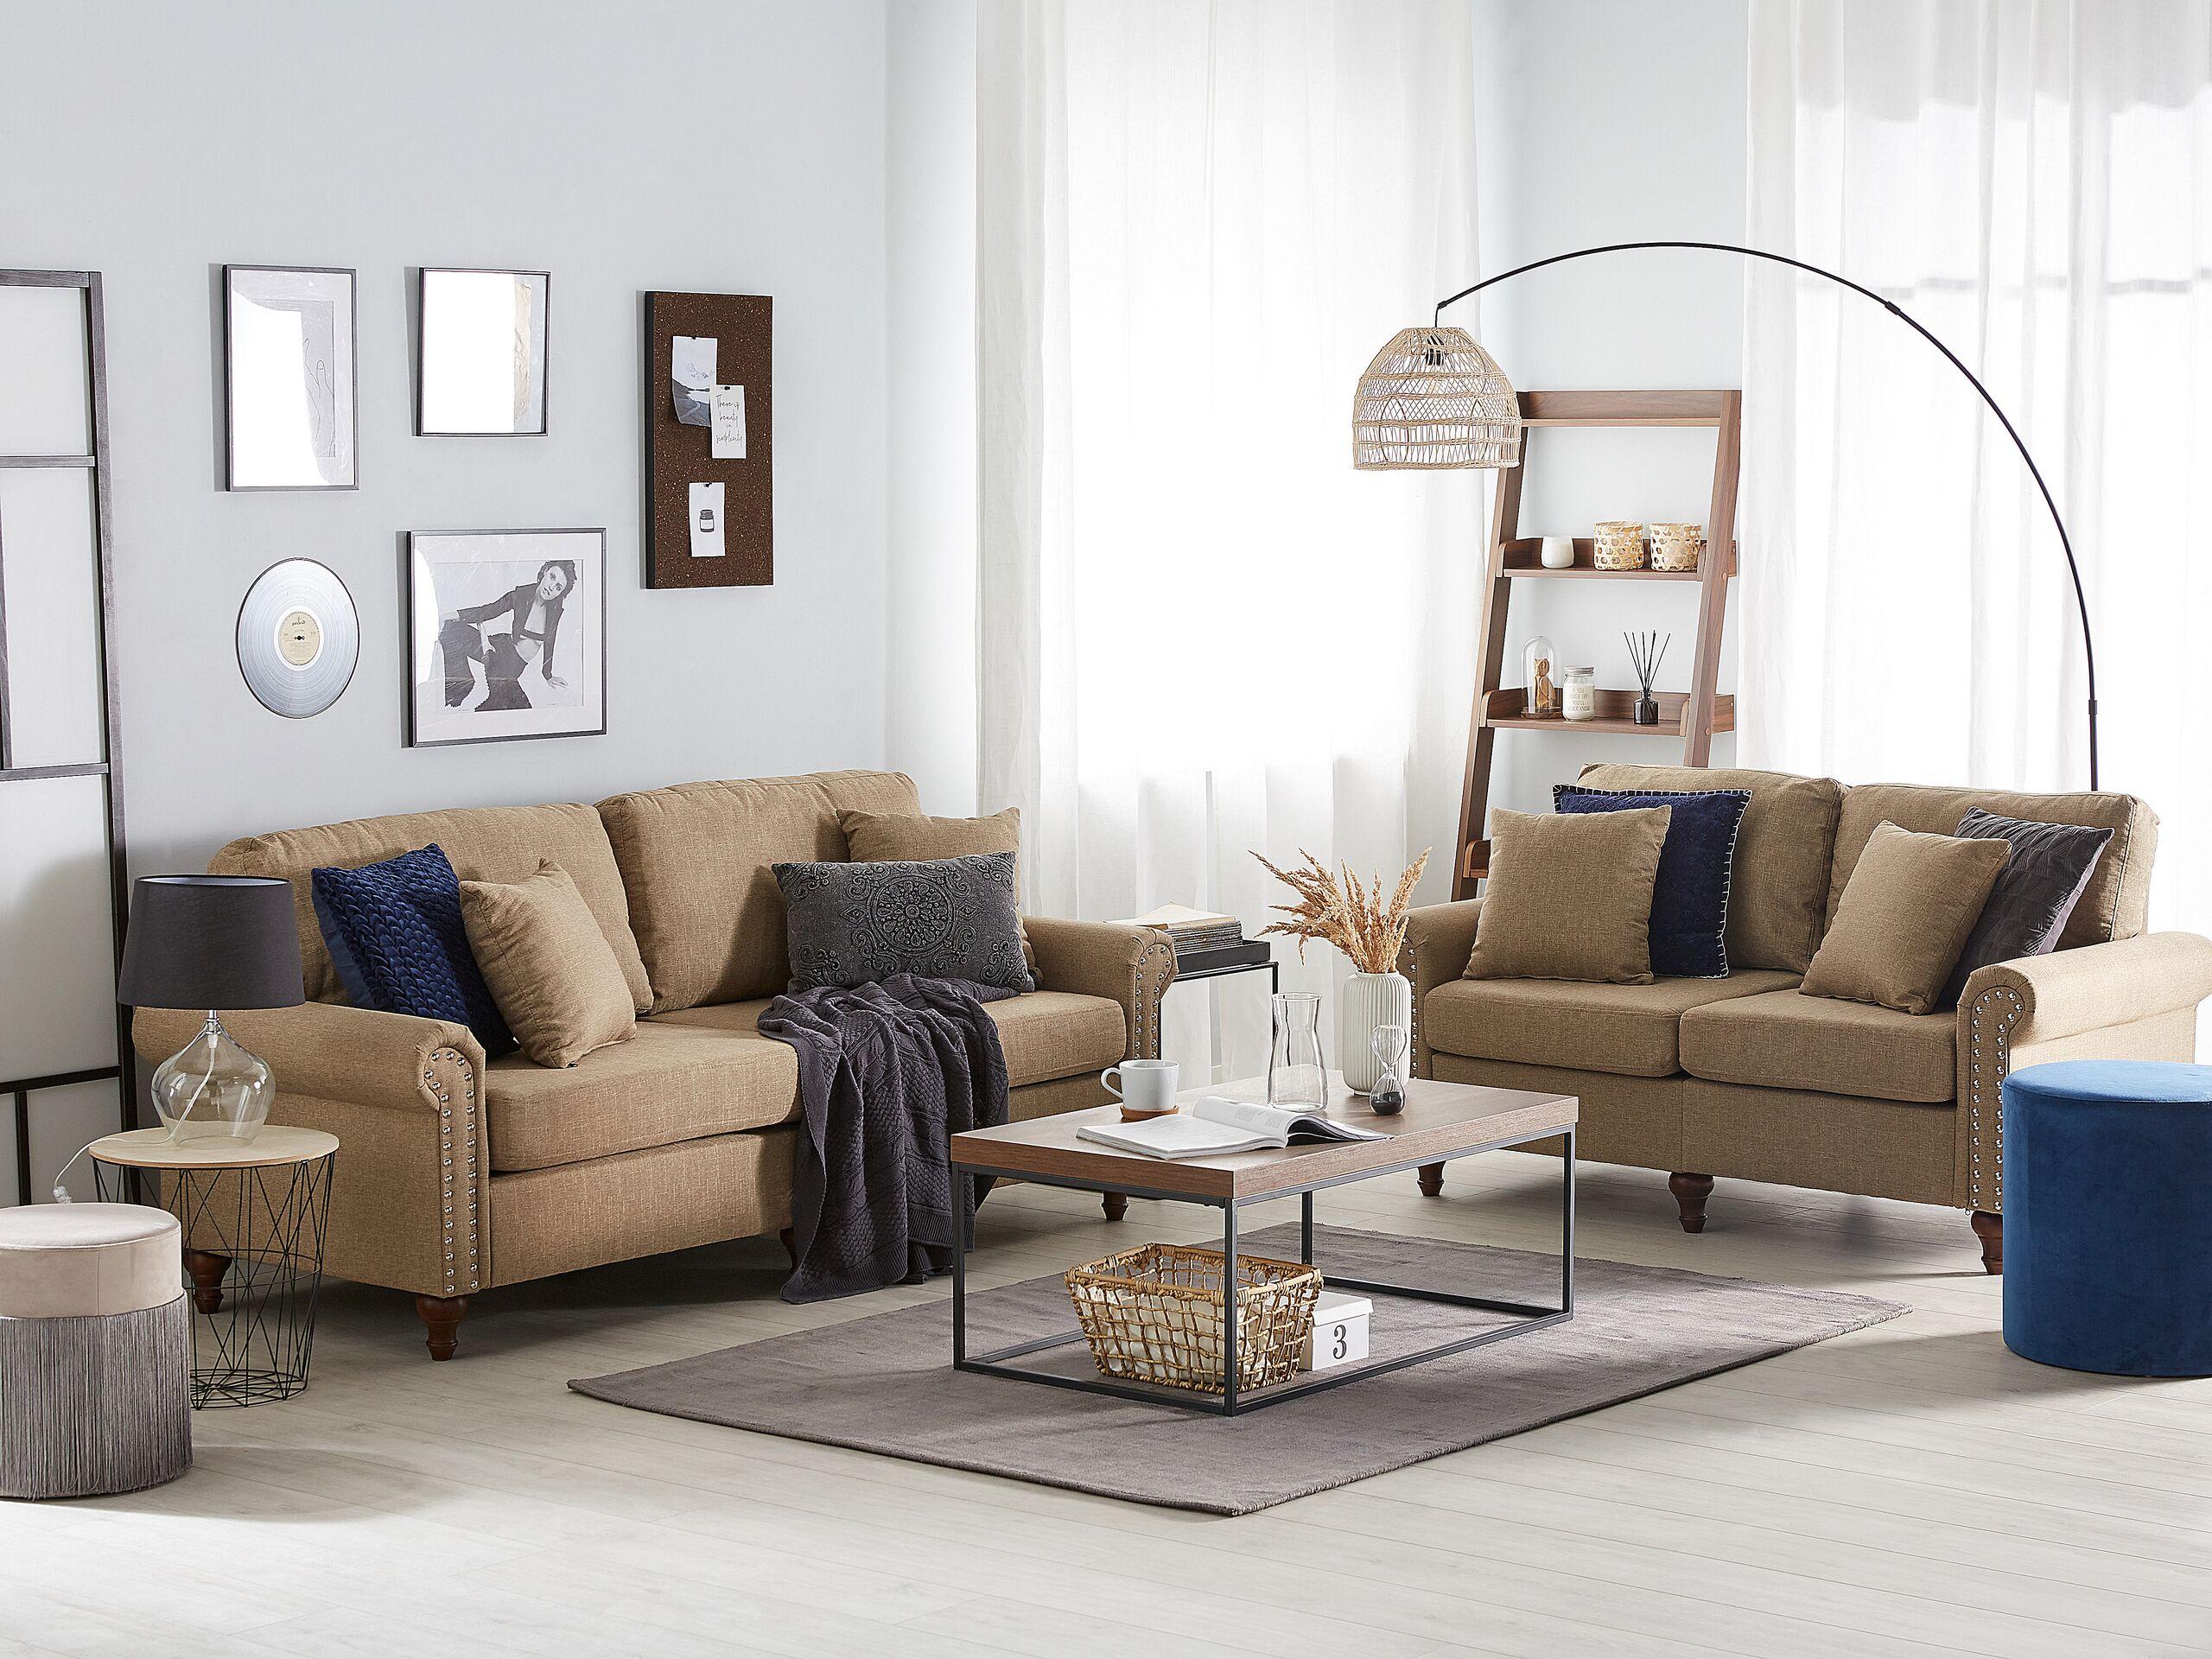 beliani set divani 5 posti colore beige sabbia